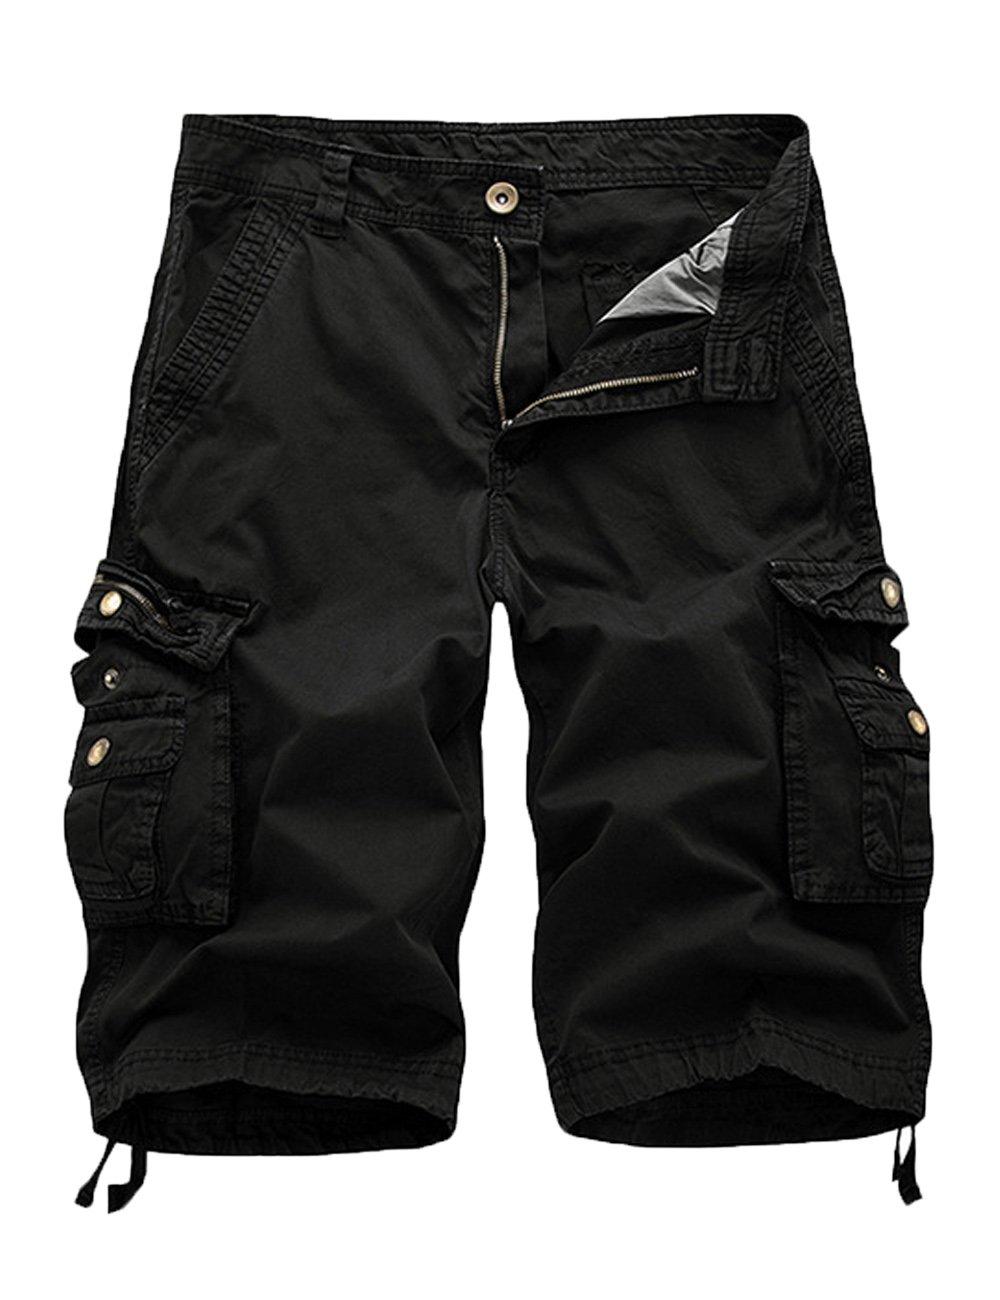 FOURSTEEDS Women's Cotton Butt Lift Zipper Multi-Pockets Twill Bermuda Drawstring Women Cargo Shorts Black US 10